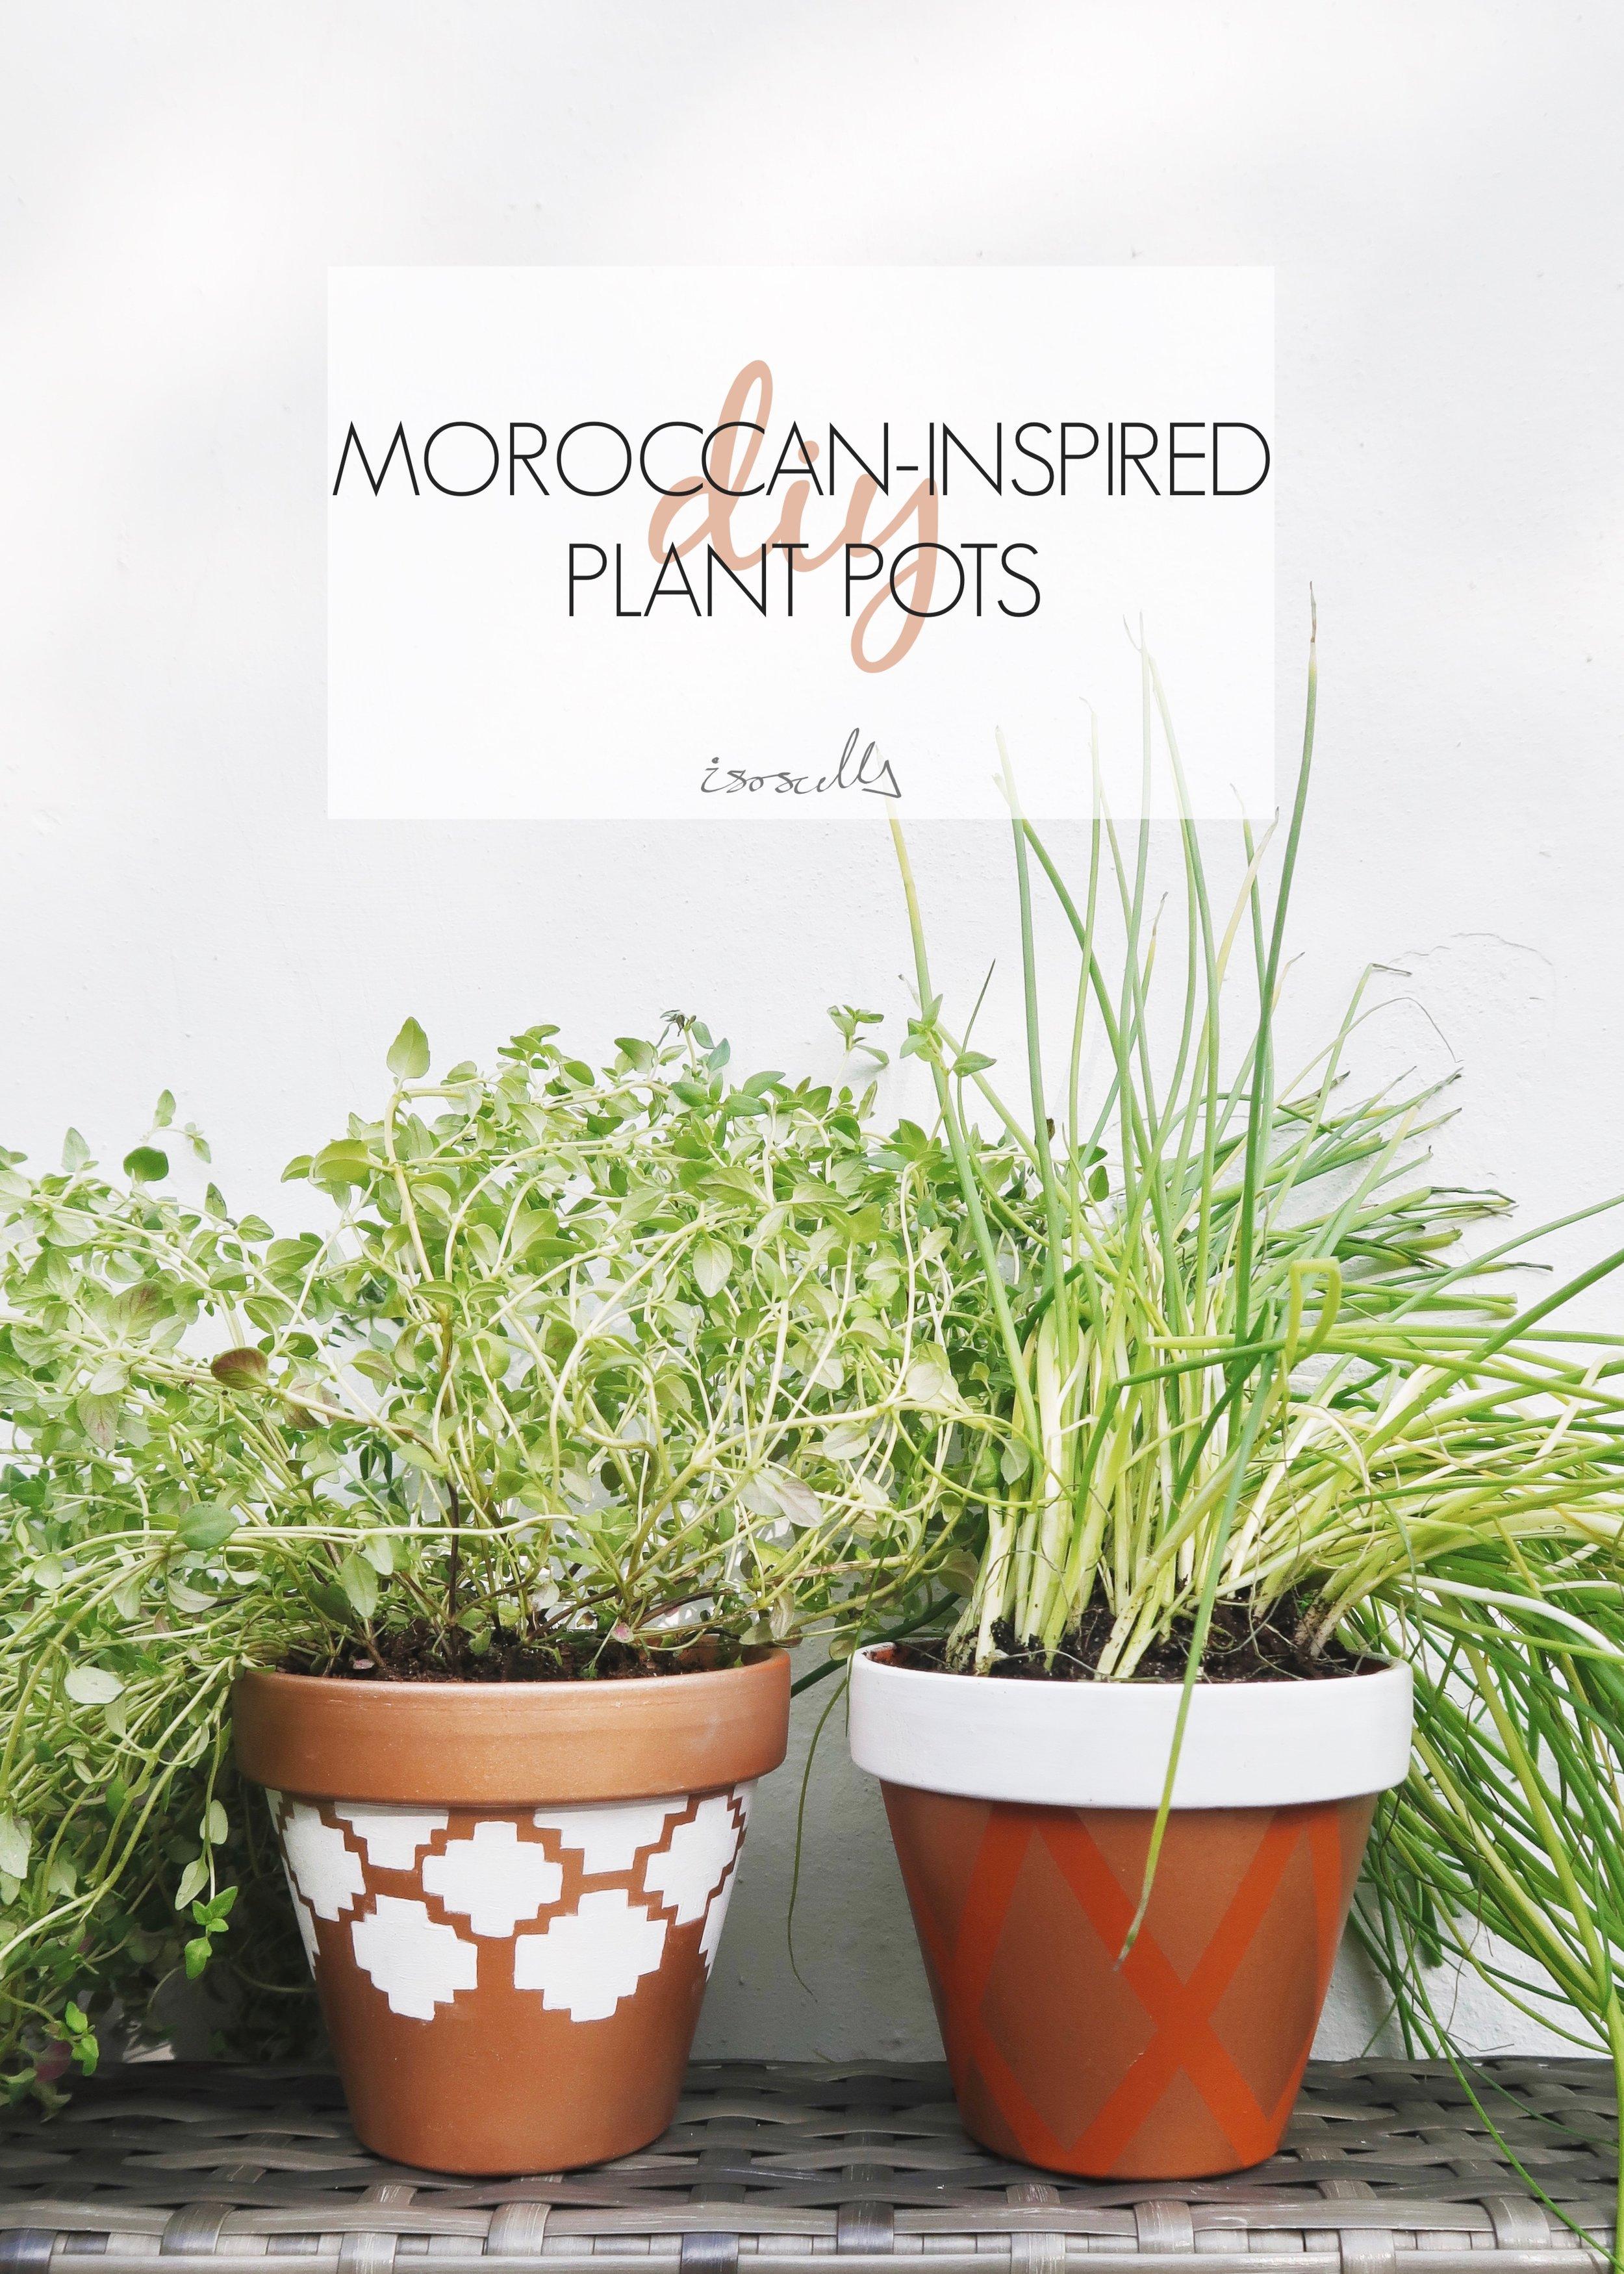 DIY Moroccan-inspired Plant Pots by Isoscella